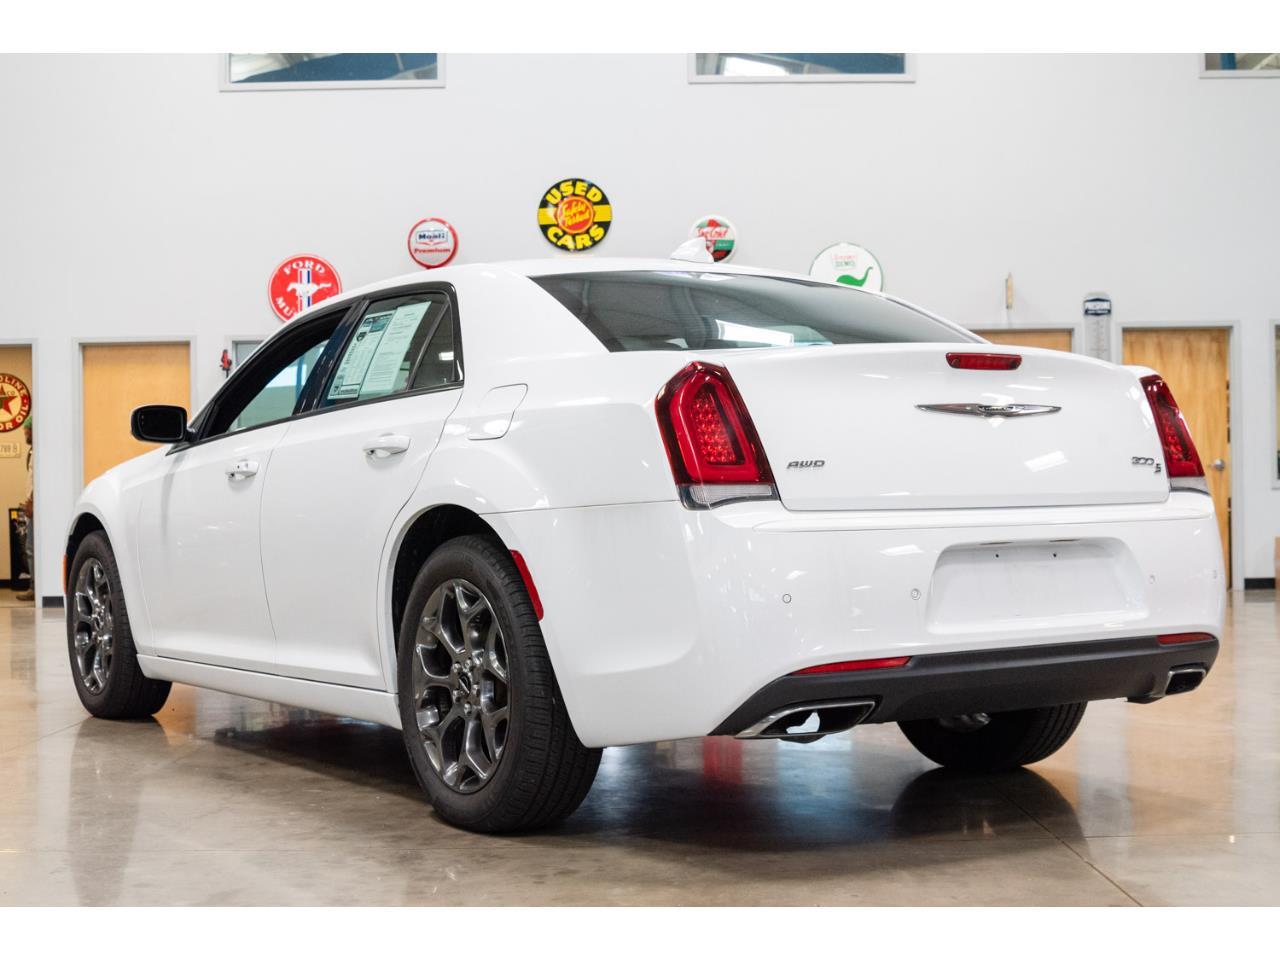 2016 Chrysler 300 (CC-1158428) for sale in Salem, Ohio